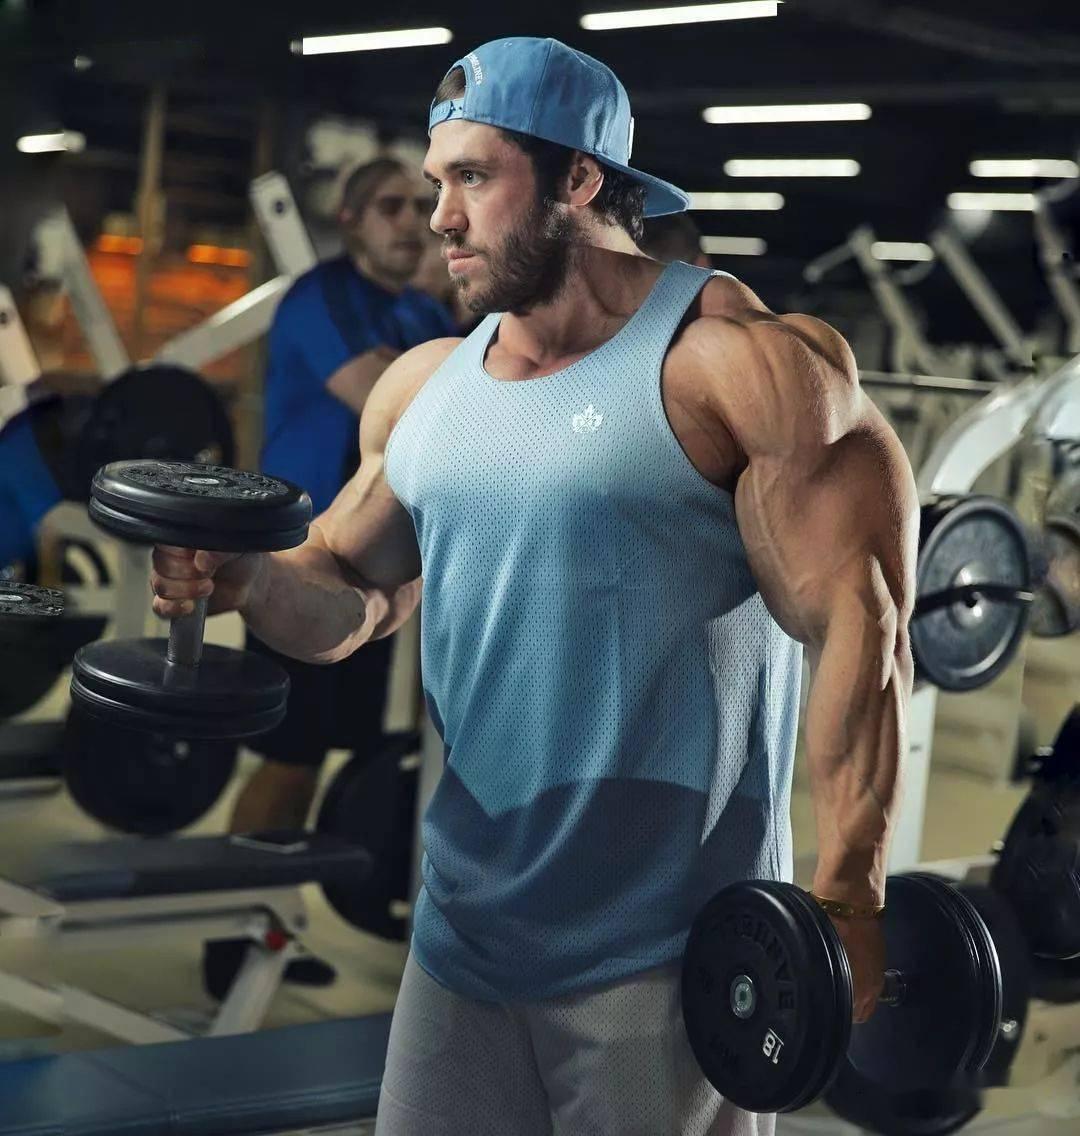 55cm臂围的肌肉硬汉,看了他的奶爸日常,我都想生娃了 初级健身 第4张